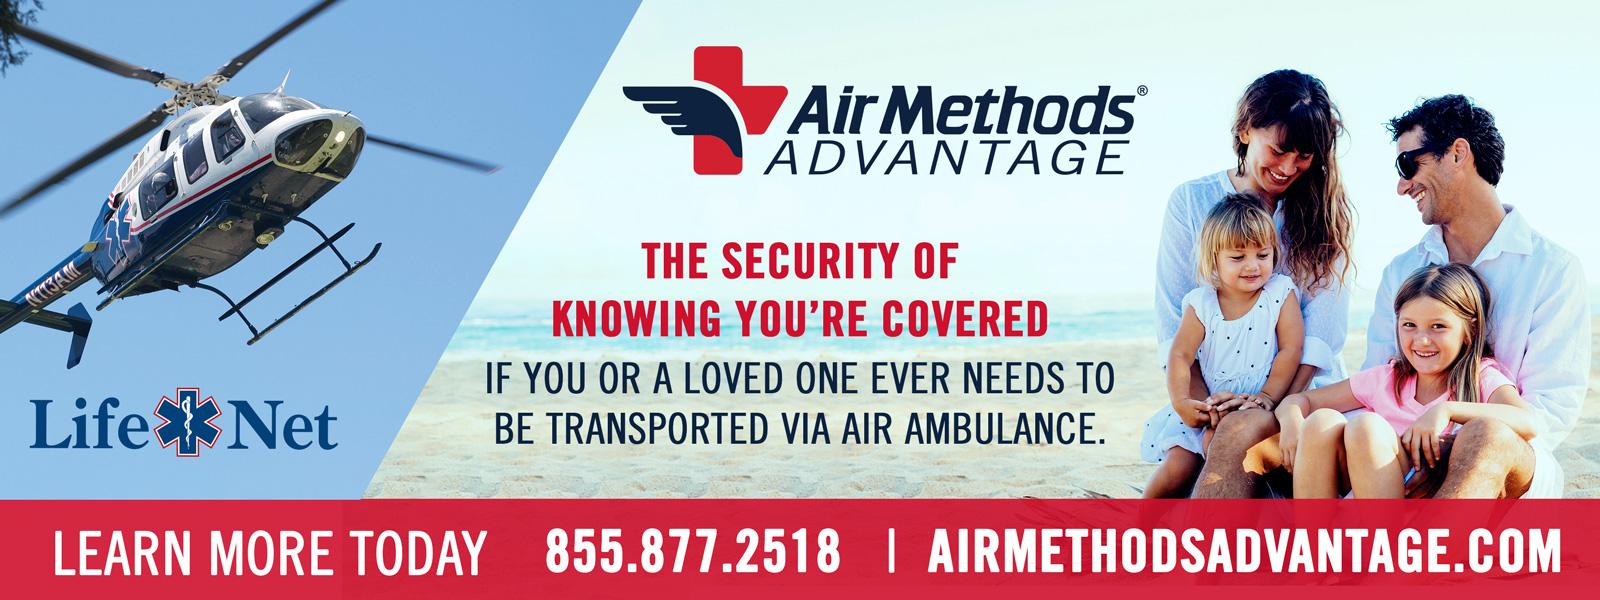 Air Methods Advantage / Life Net